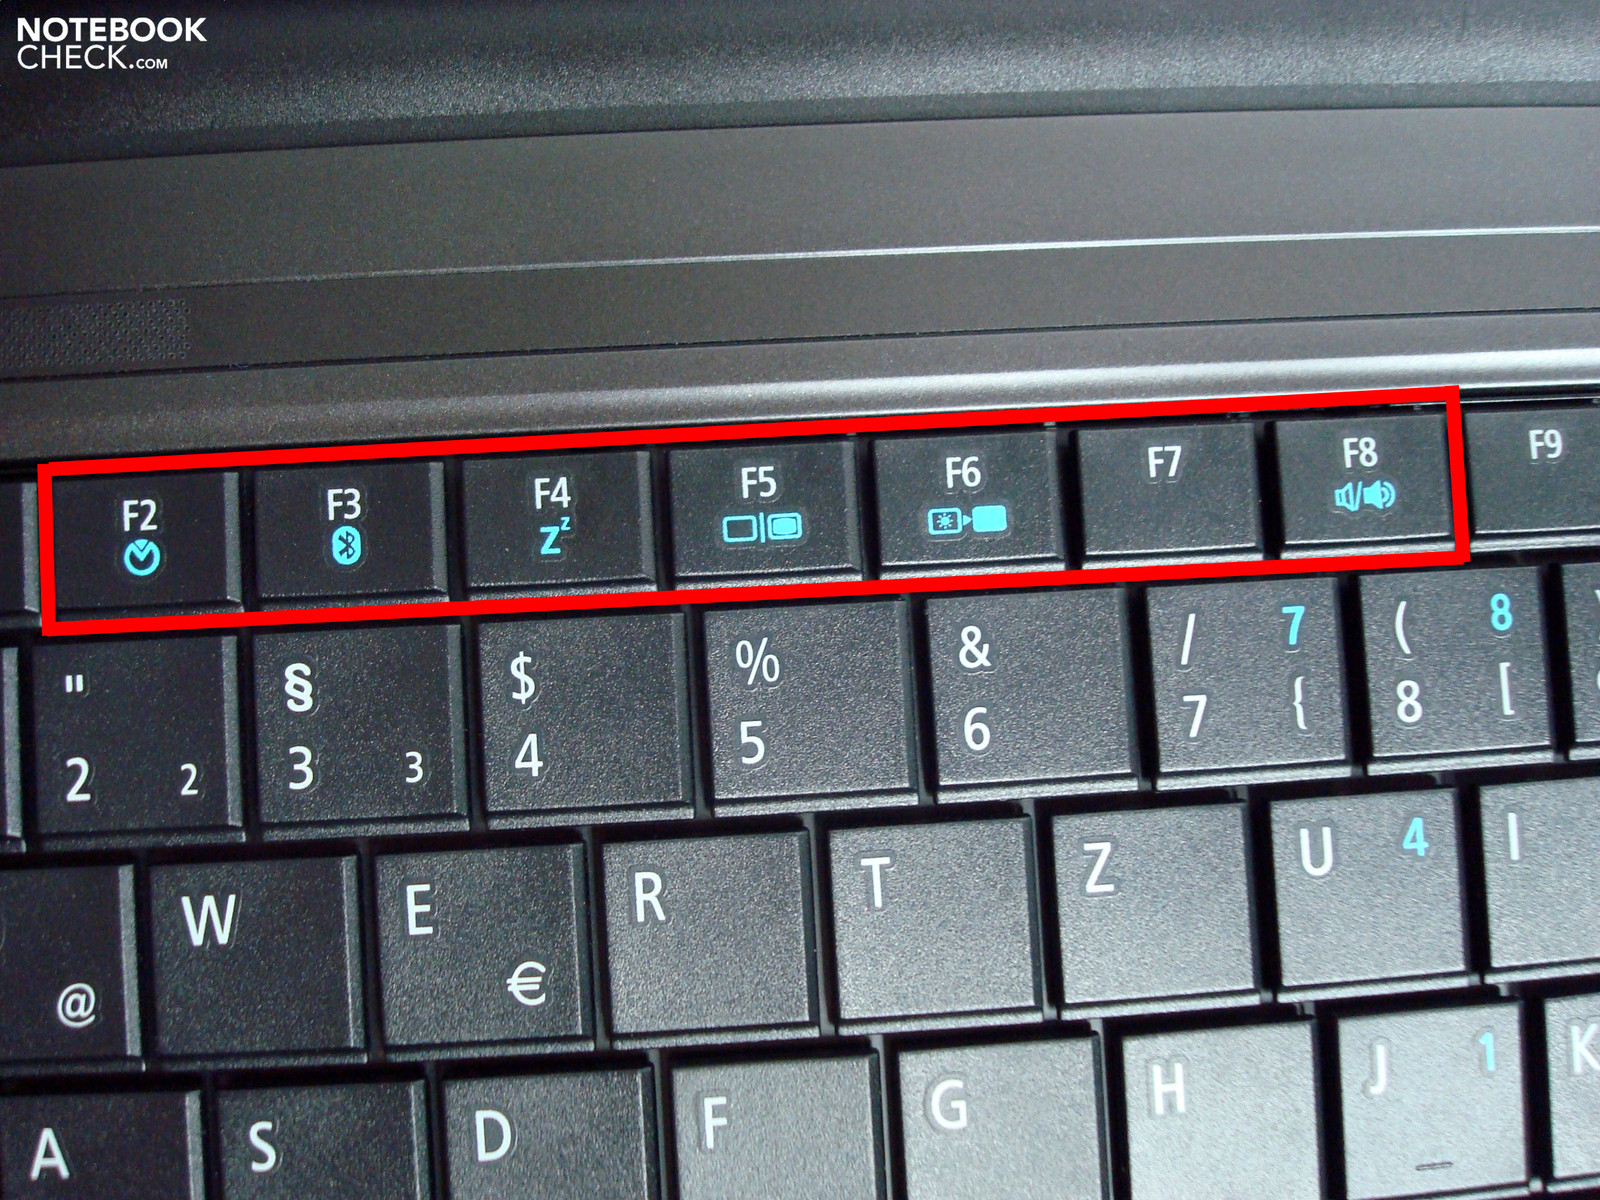 Testrapport Acer Travelmate 8371 Timeline Notebook